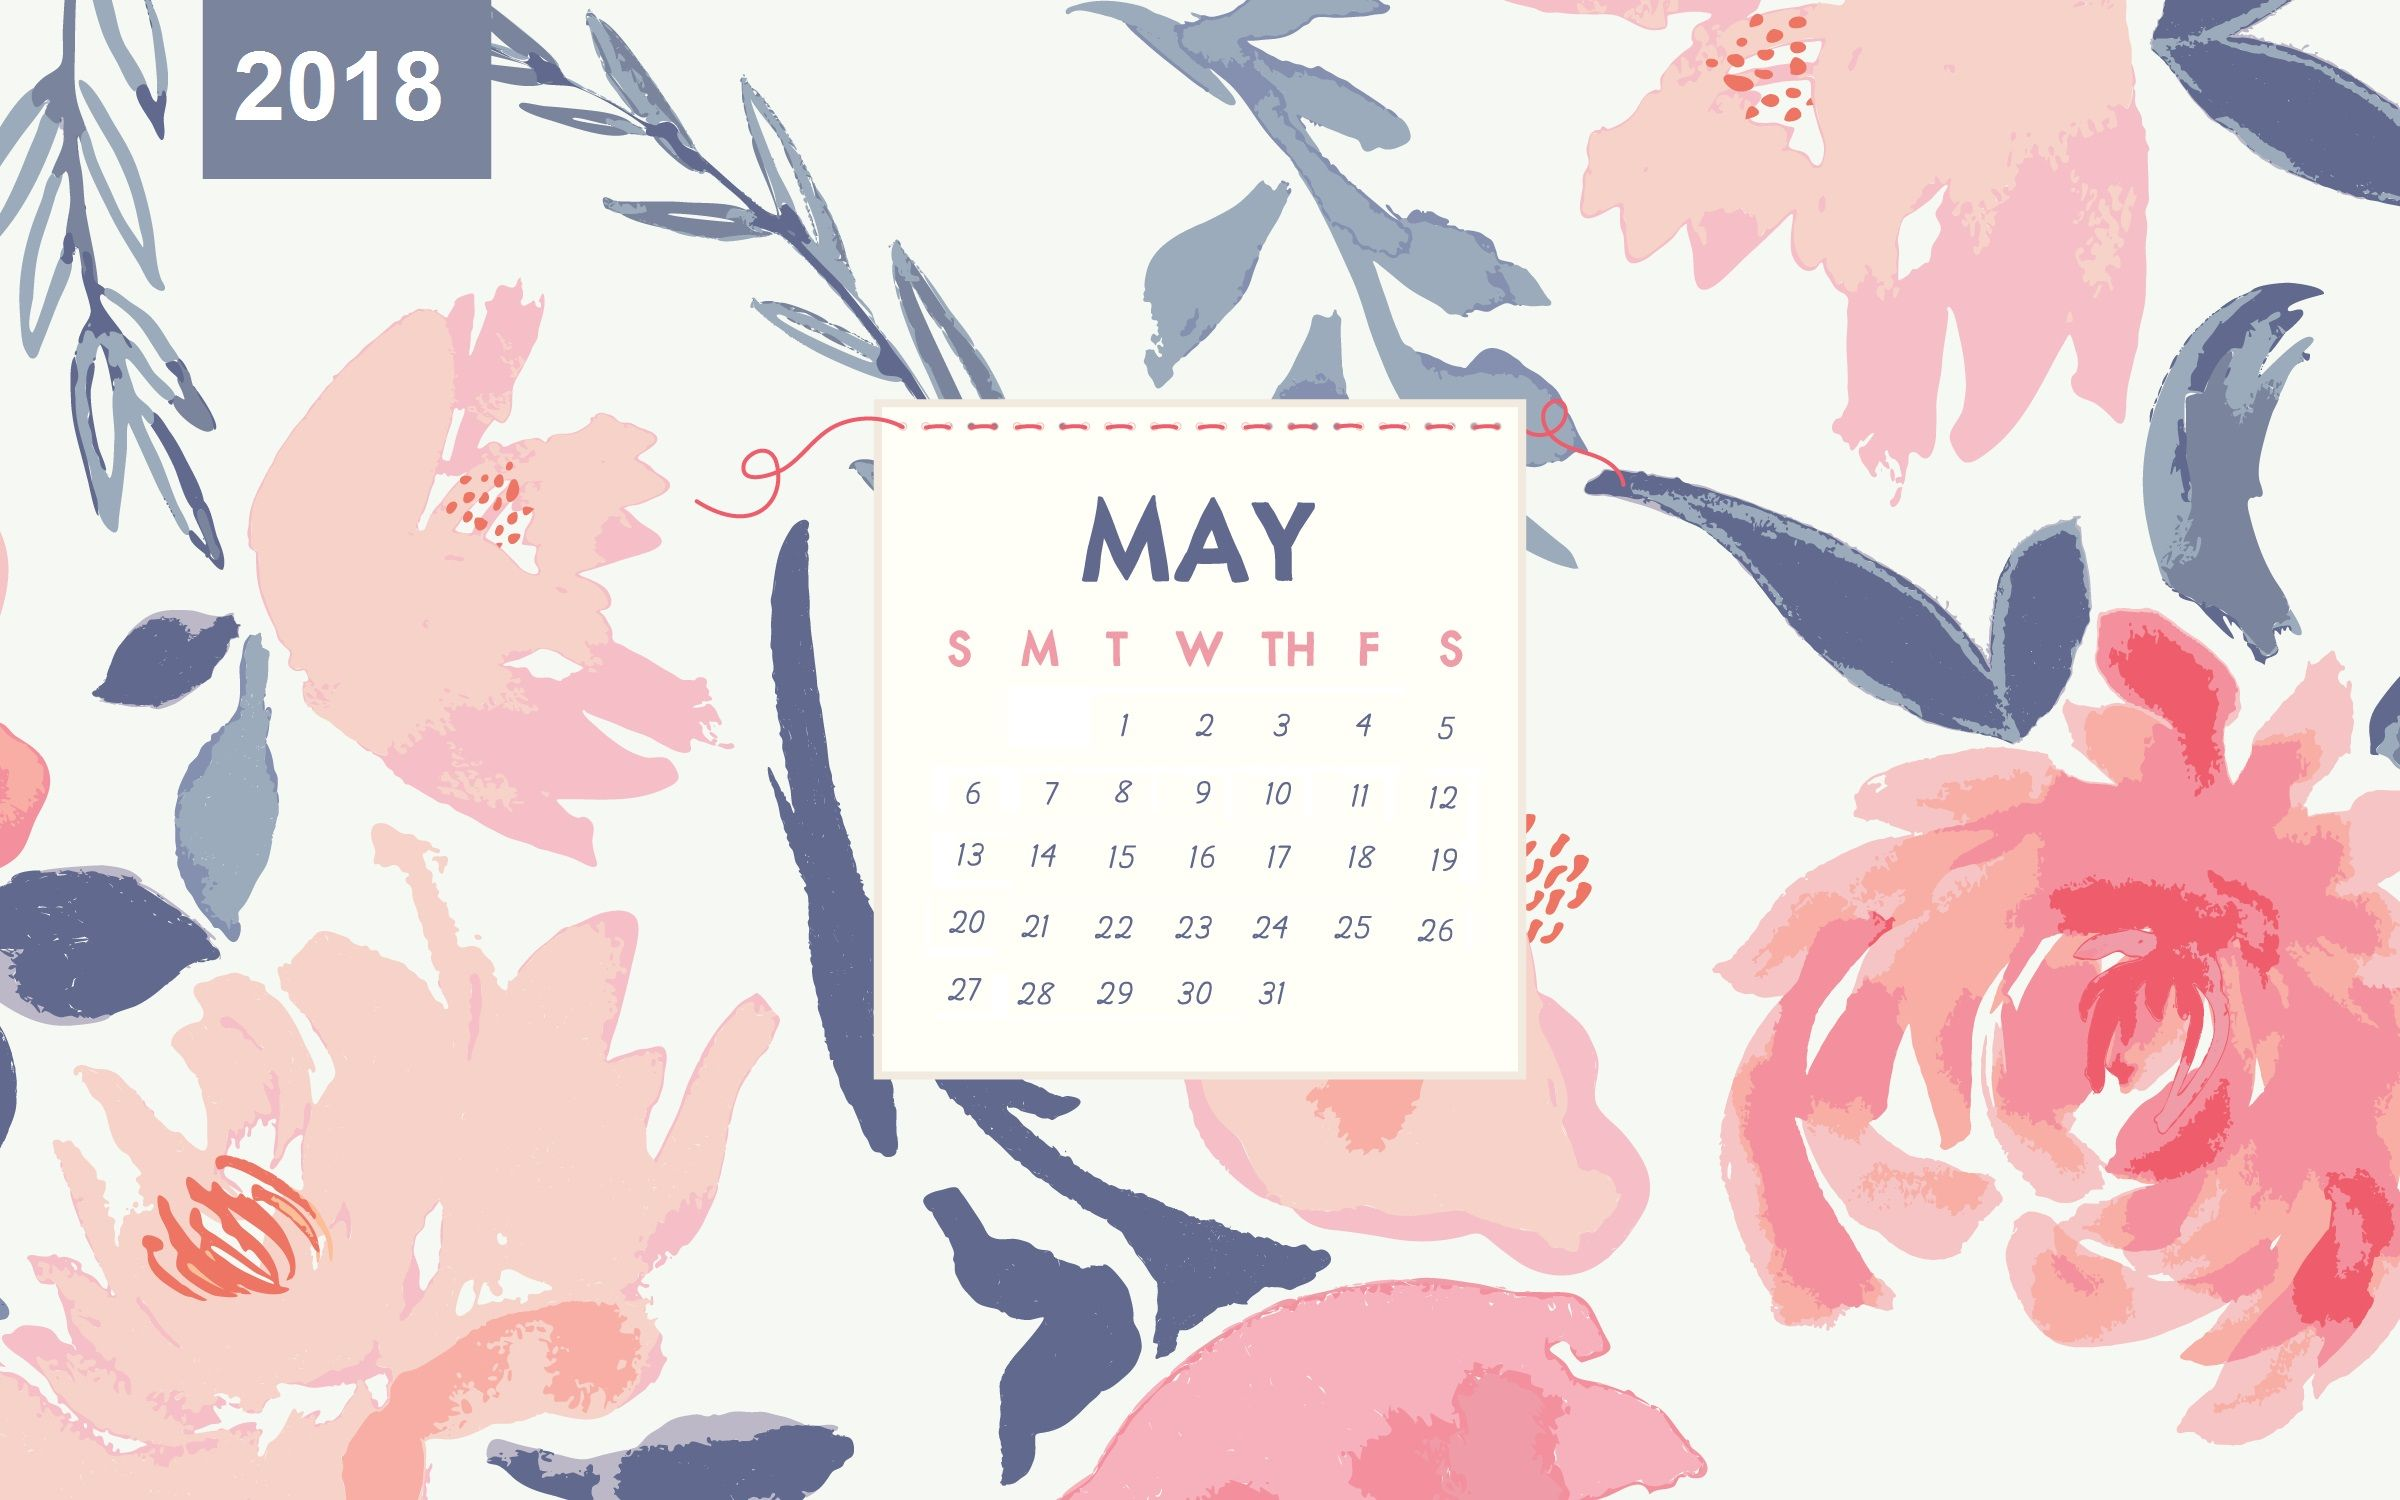 May 2018 Desktop Calendar With Images Desktop Wallpaper Calendar Calendar Wallpaper Desktop Calendar